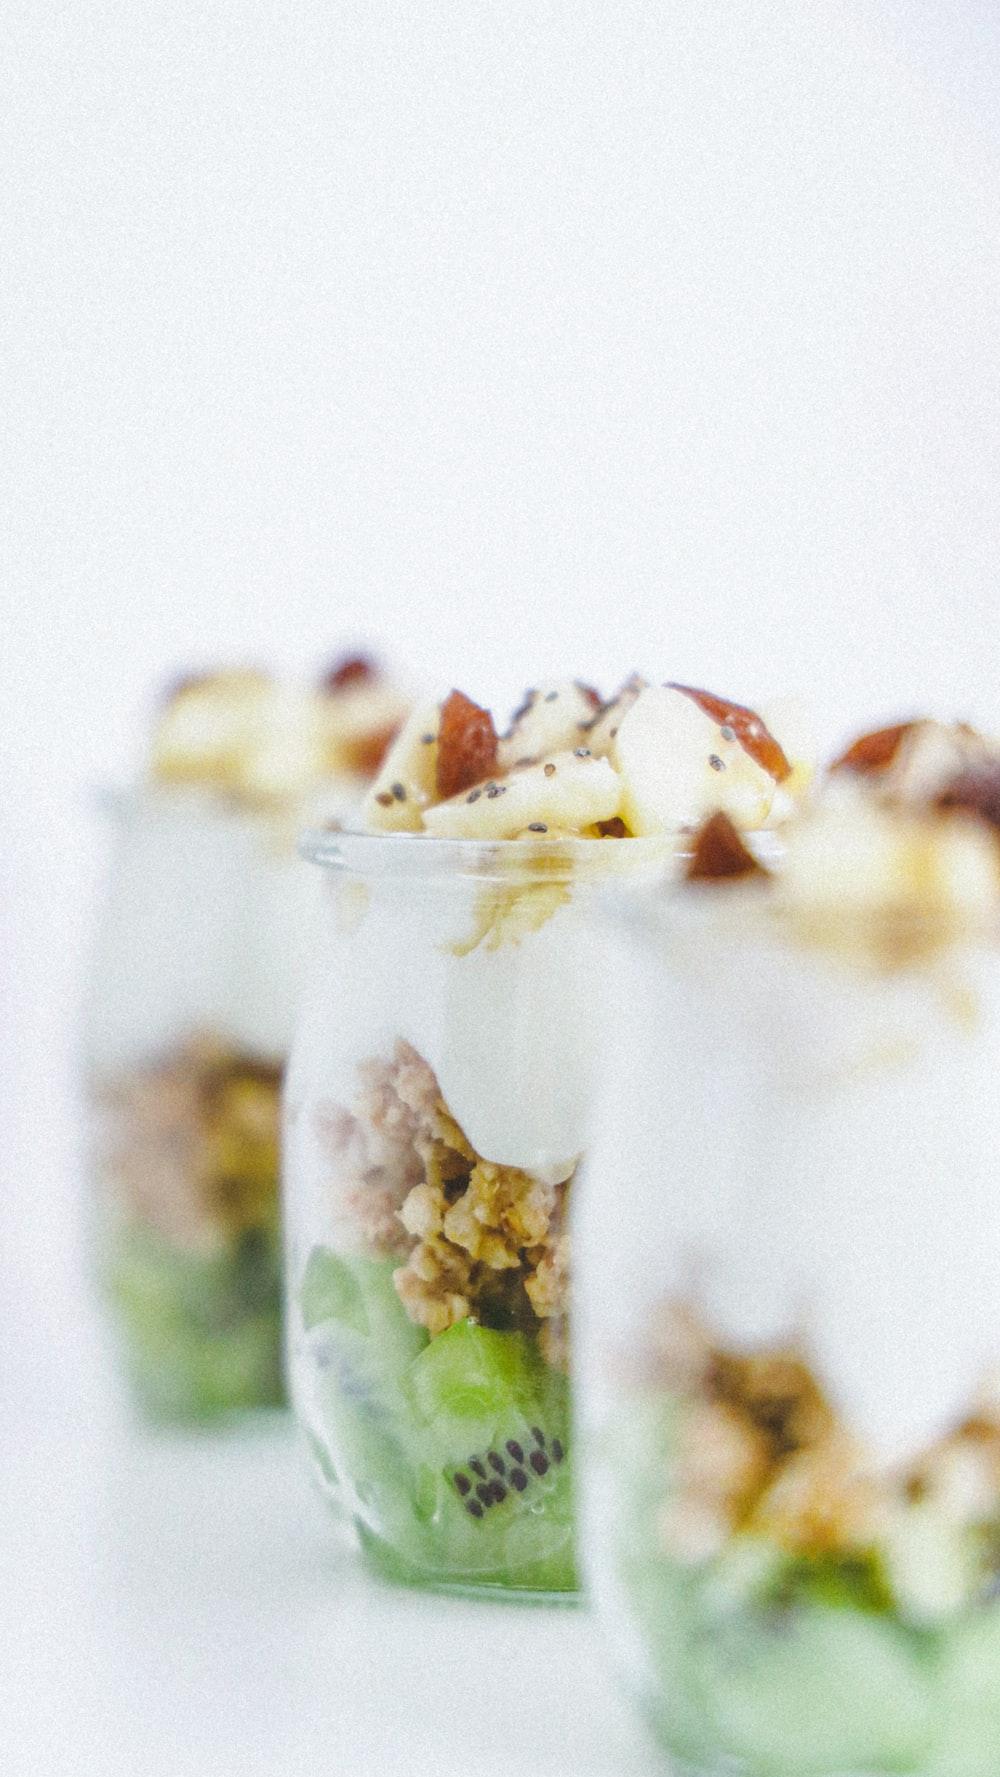 kiwi and almond nut desserts